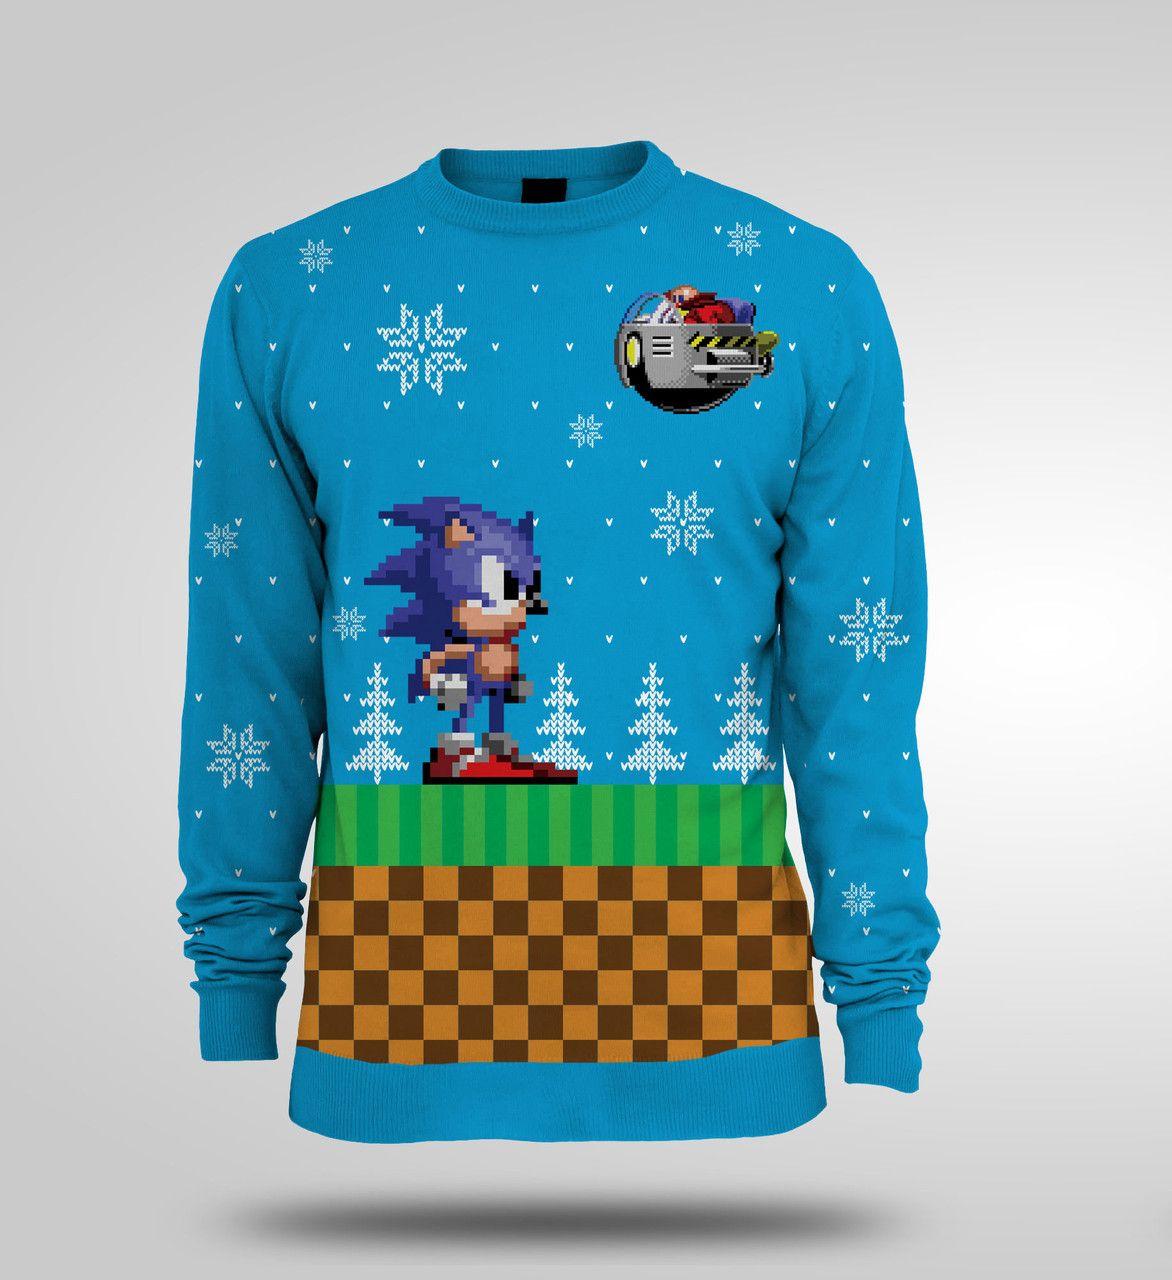 Hedgehog Christmas Jumper.Pin By Rea Khan On Sweaters Christmas Sweaters Christmas